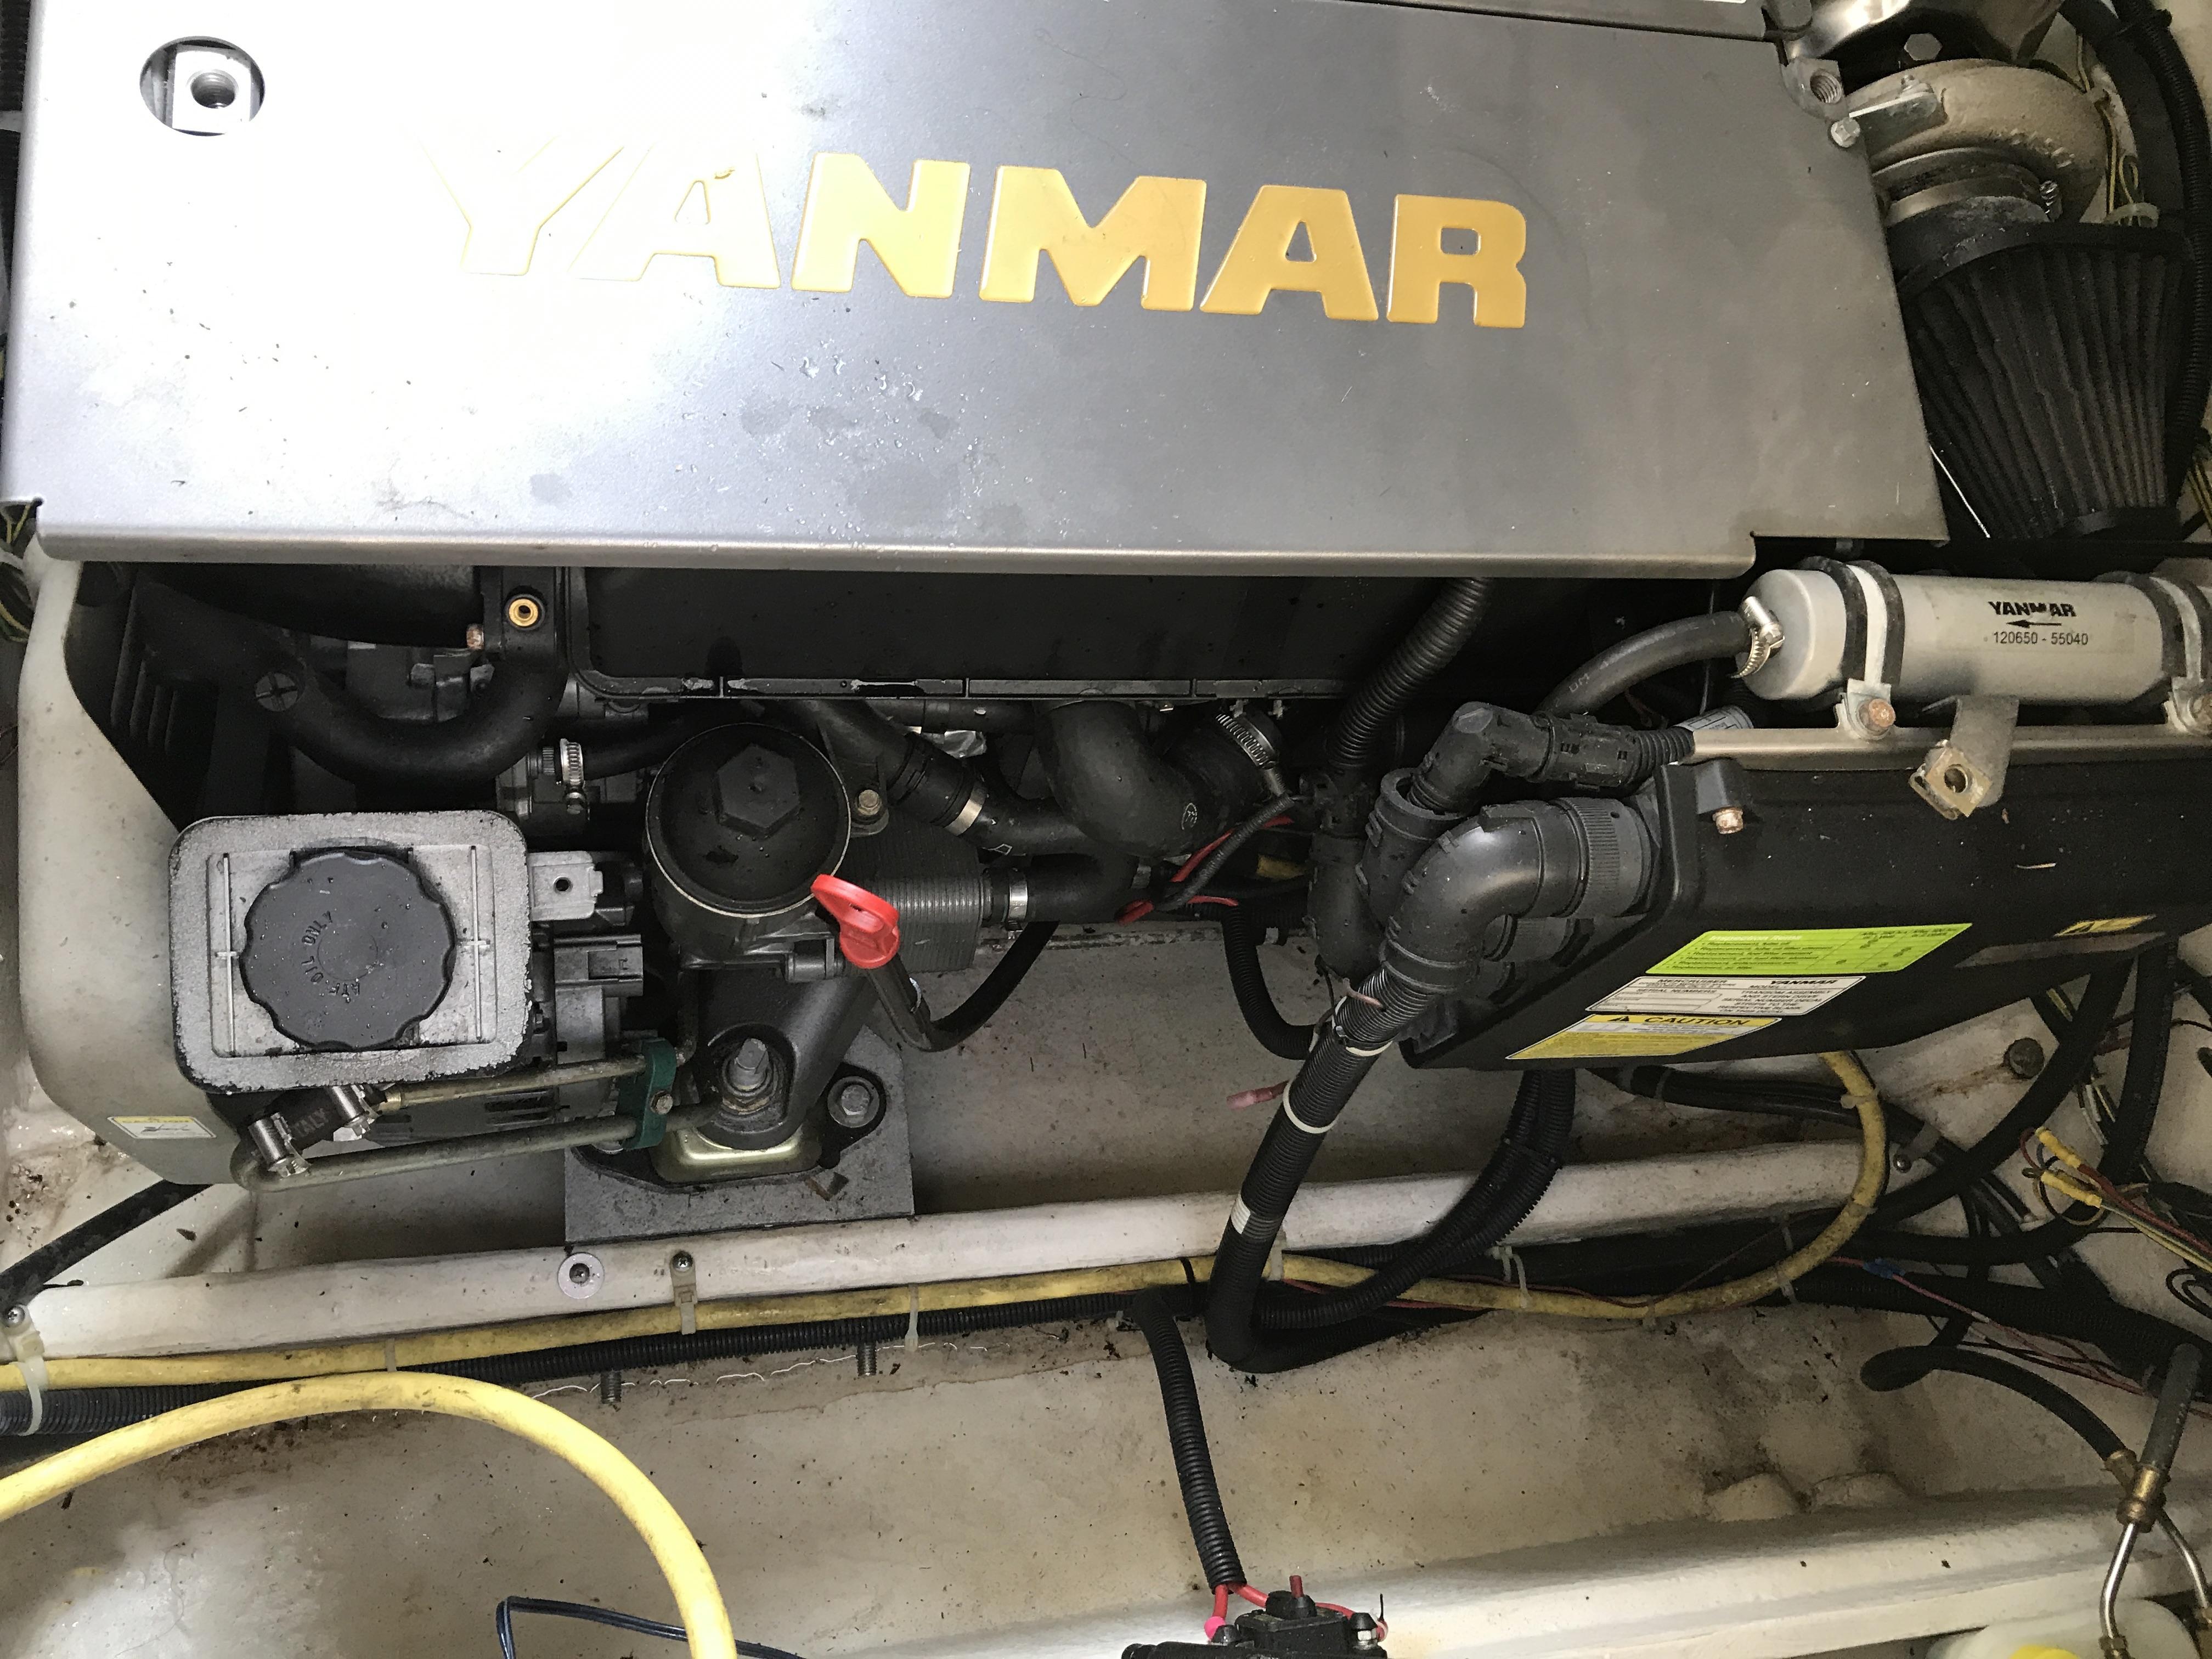 Bayliner Discovery 246 EC - Yanmar diesel and engine bay